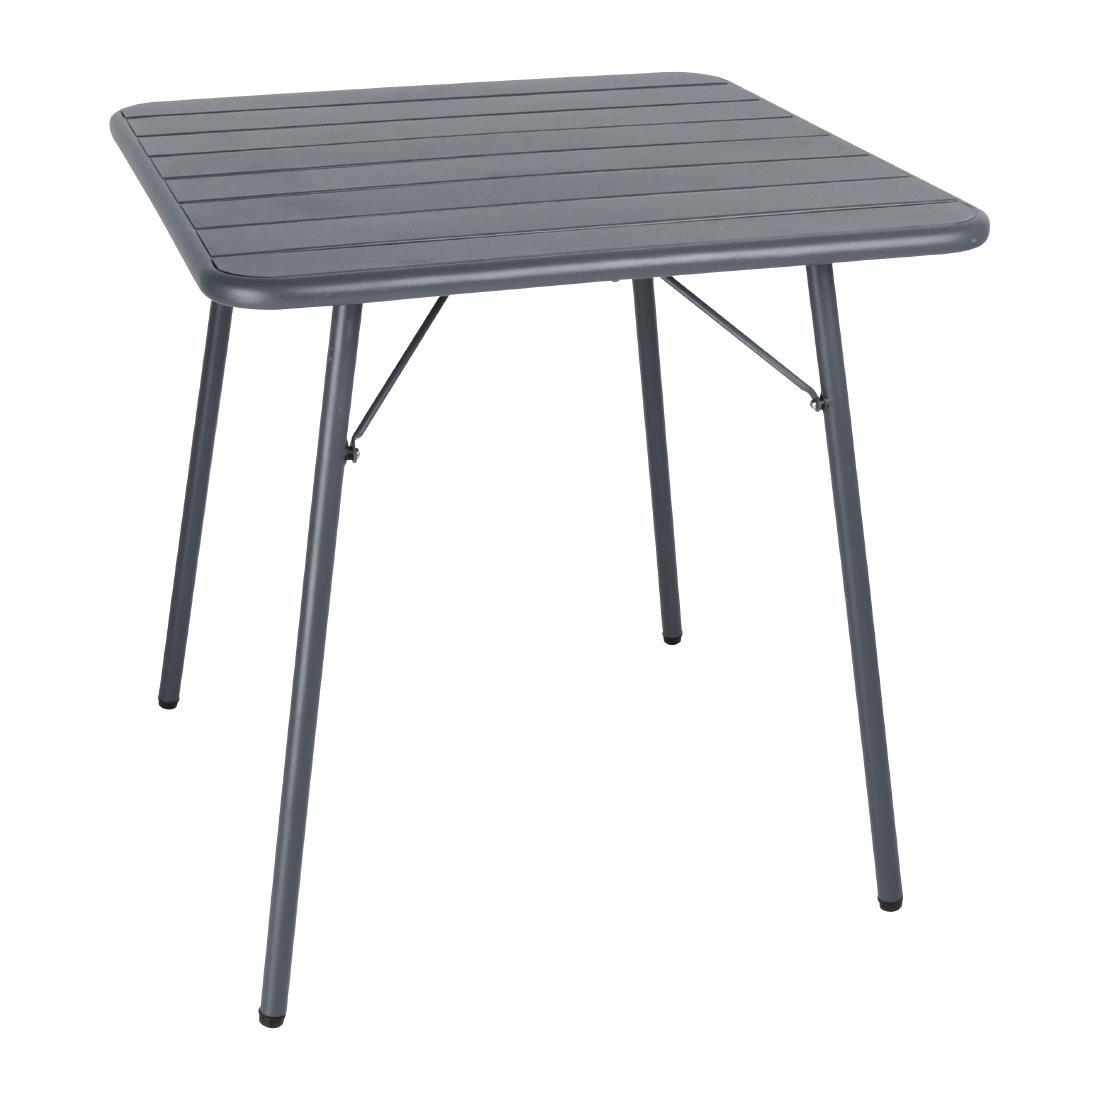 Slatted Steel Table - Grey